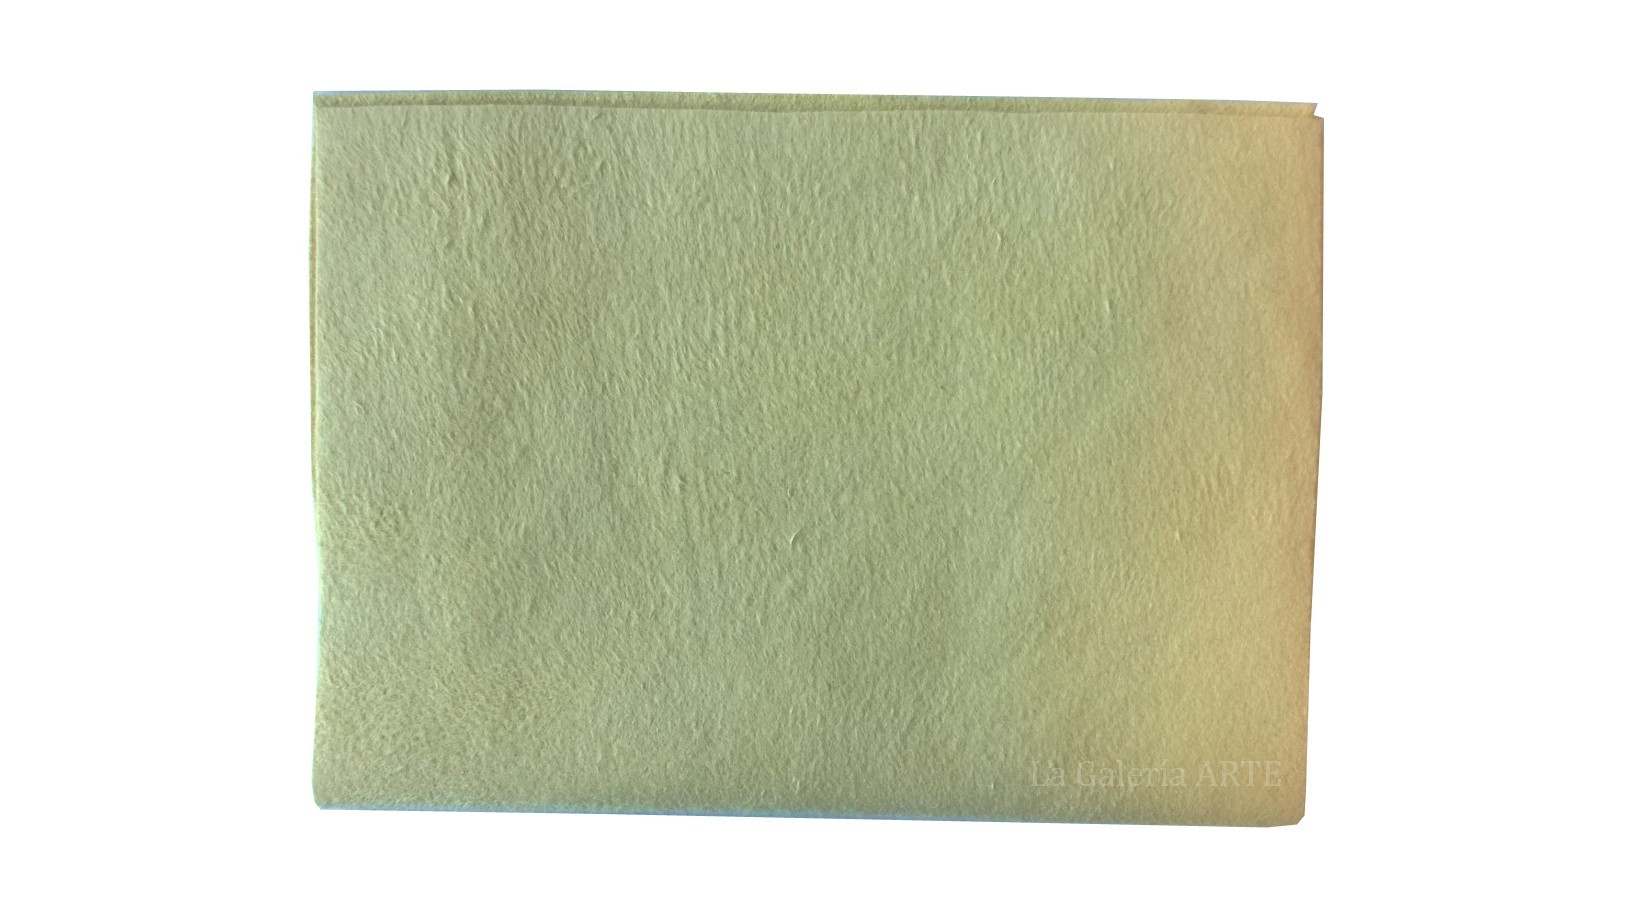 Gamuza de Piel 13x18cm Art Creation Talens